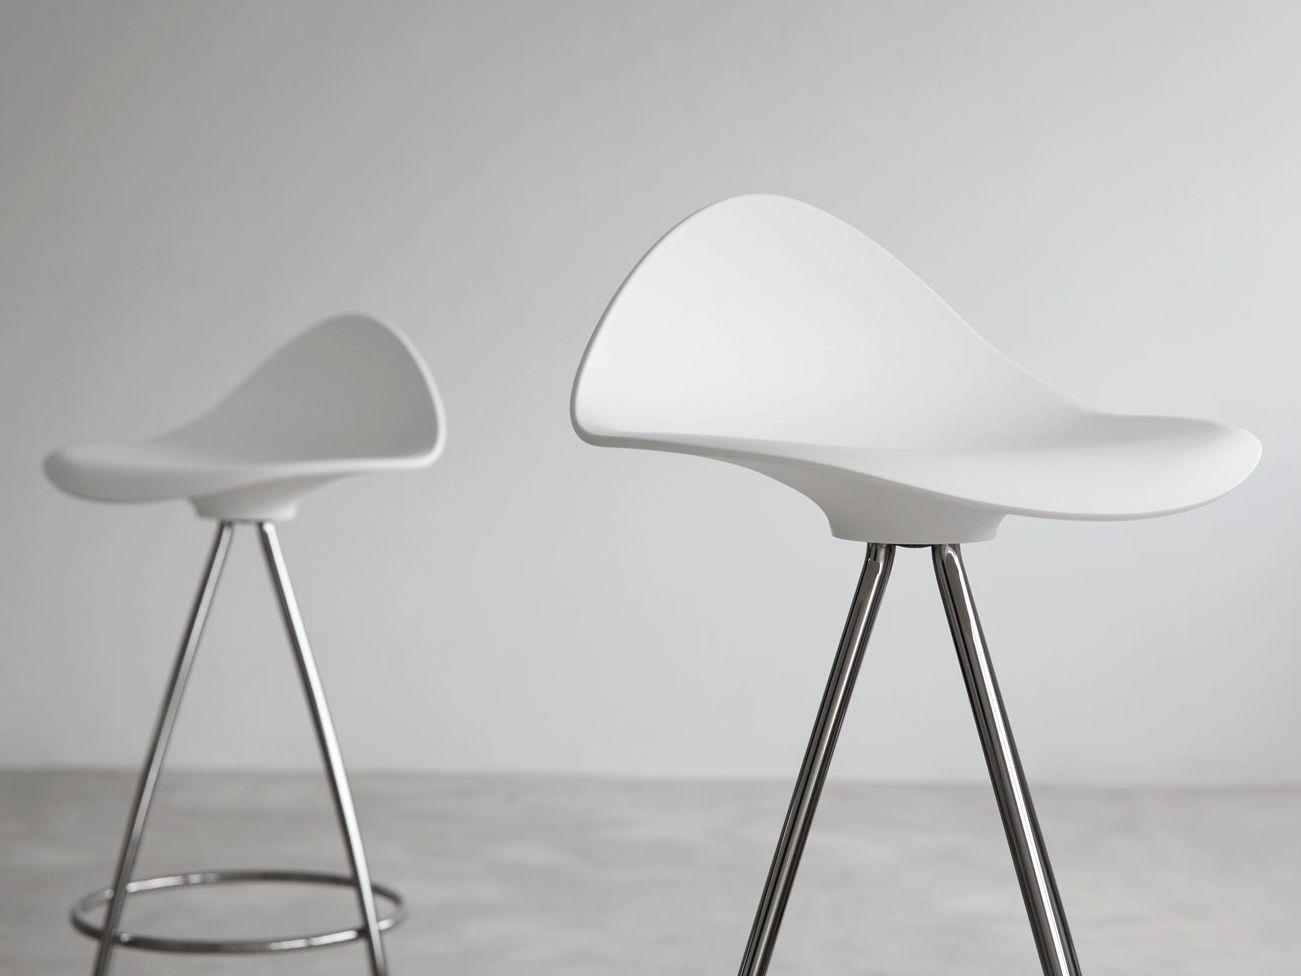 Onda Stool With Footrest By Stua Design Jes 250 S Gasca